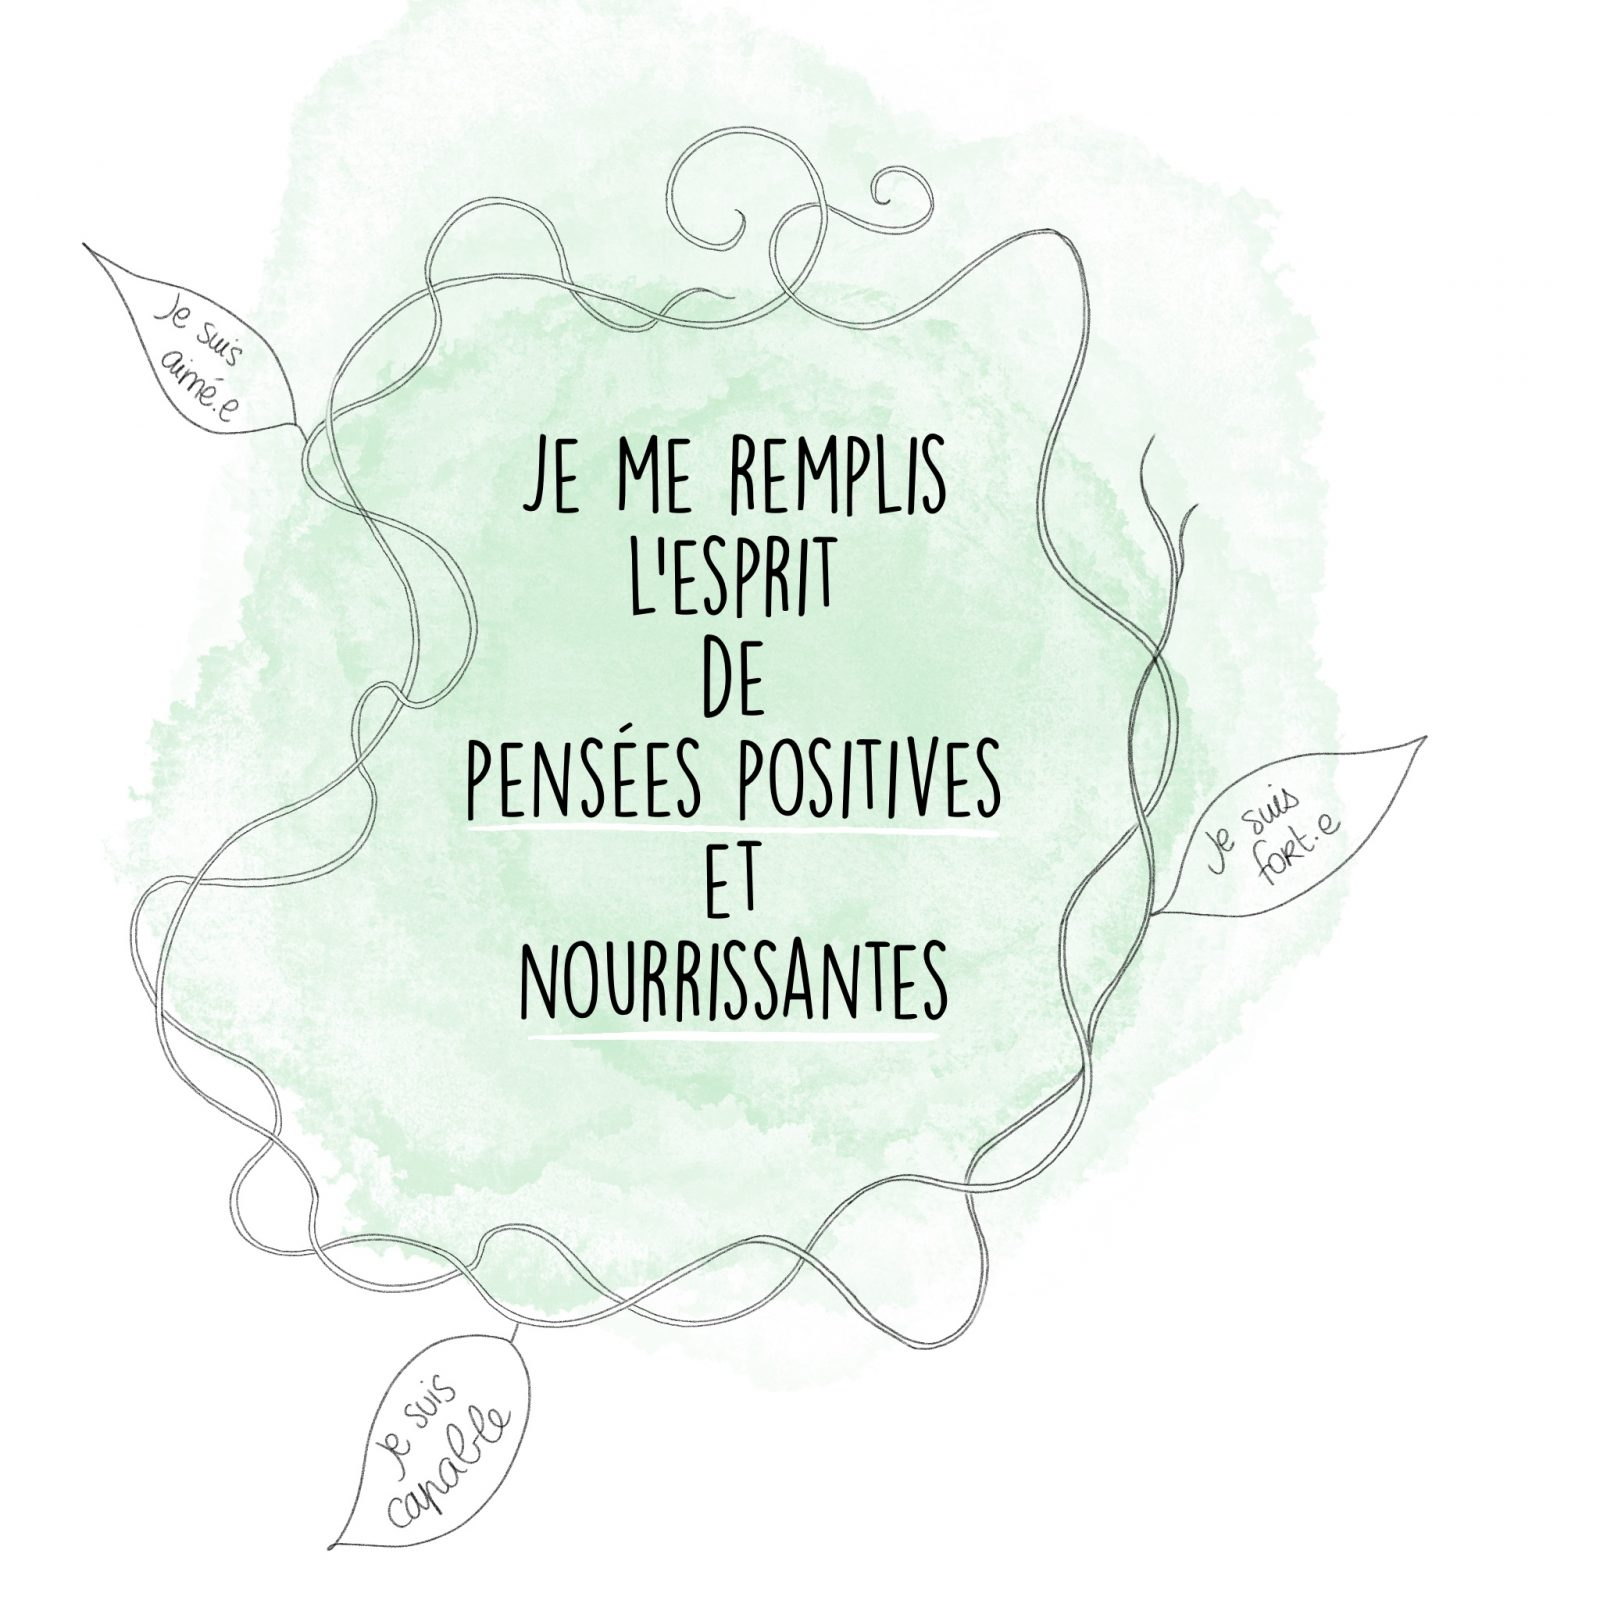 reussite-positive-5